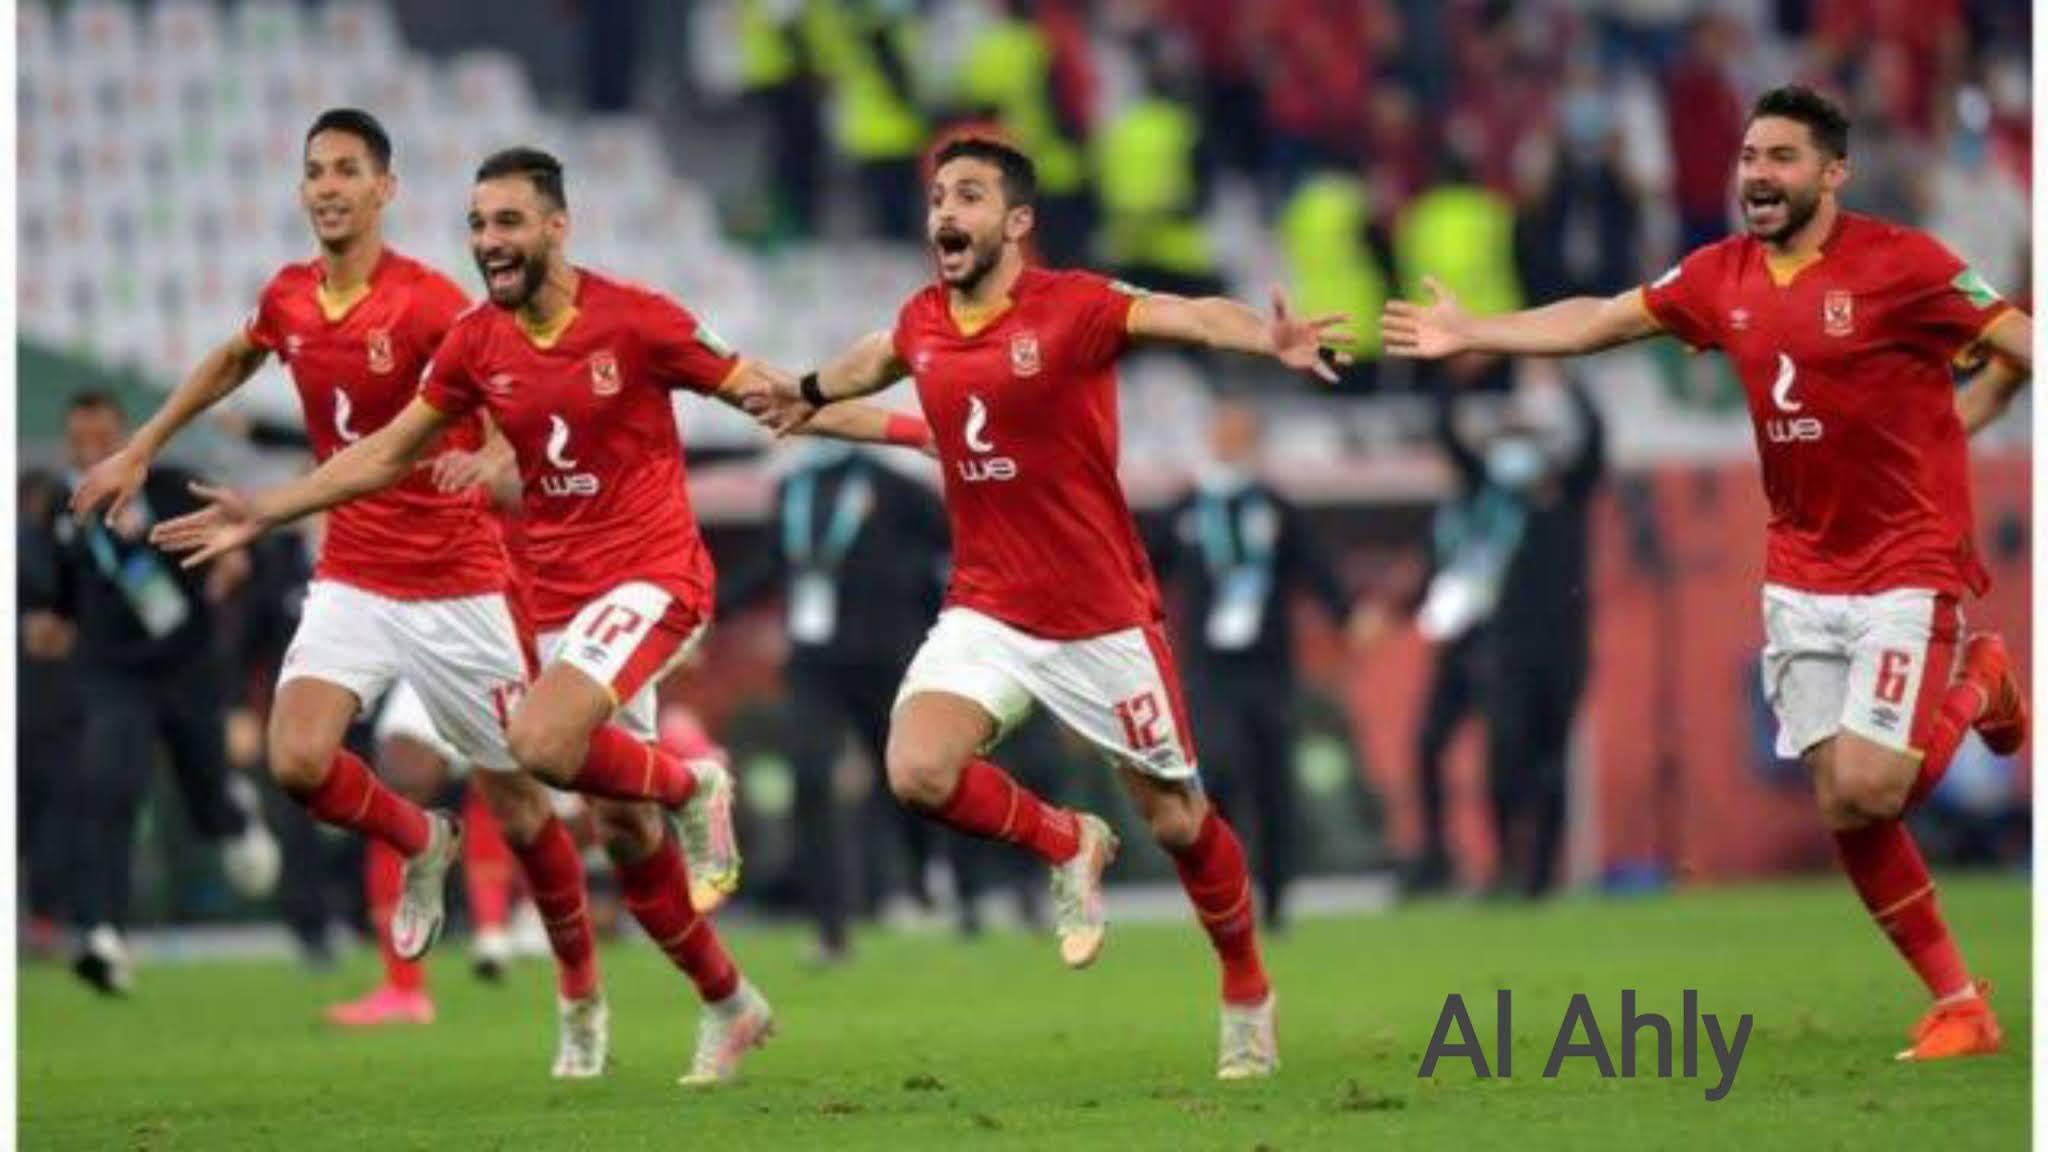 اخر اخبار الاهلي في الدوري المصري Al-Ahly of Egypt